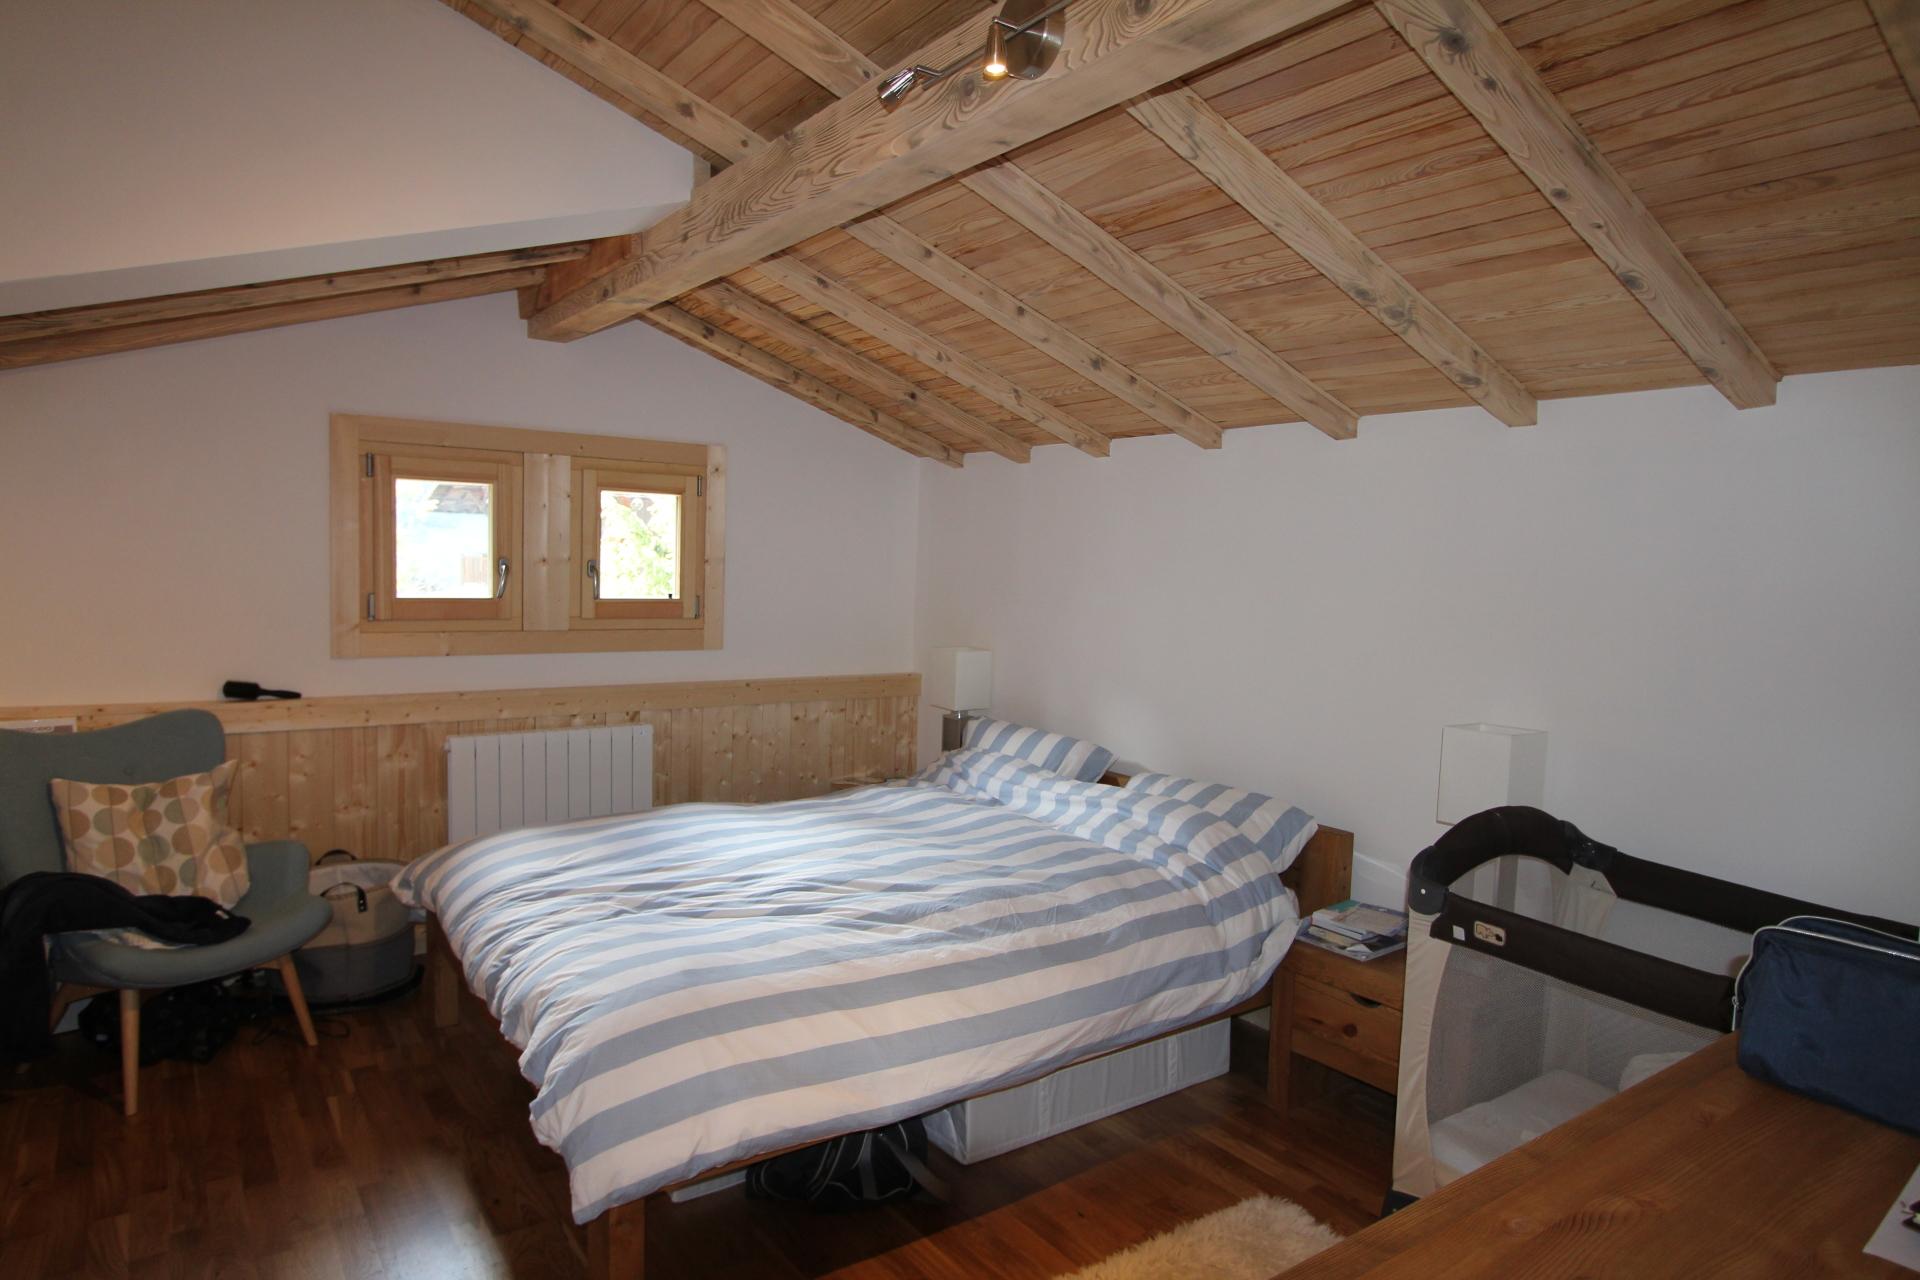 Chalet bedroom | Renovation Solutions